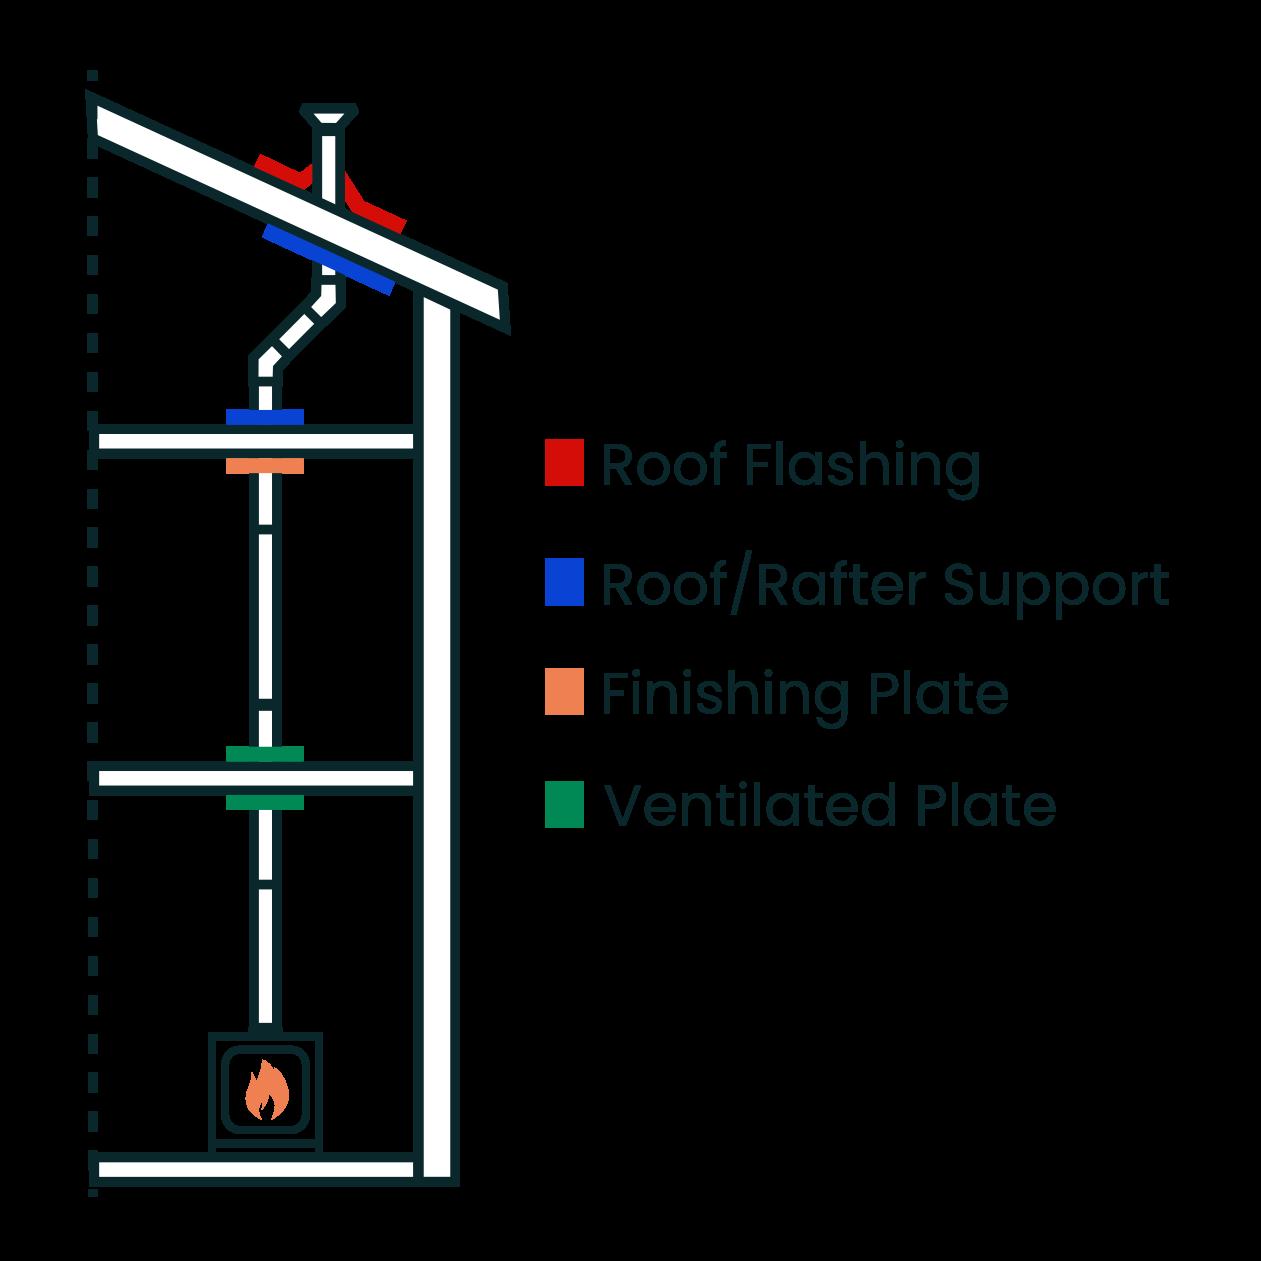 key areas diagram